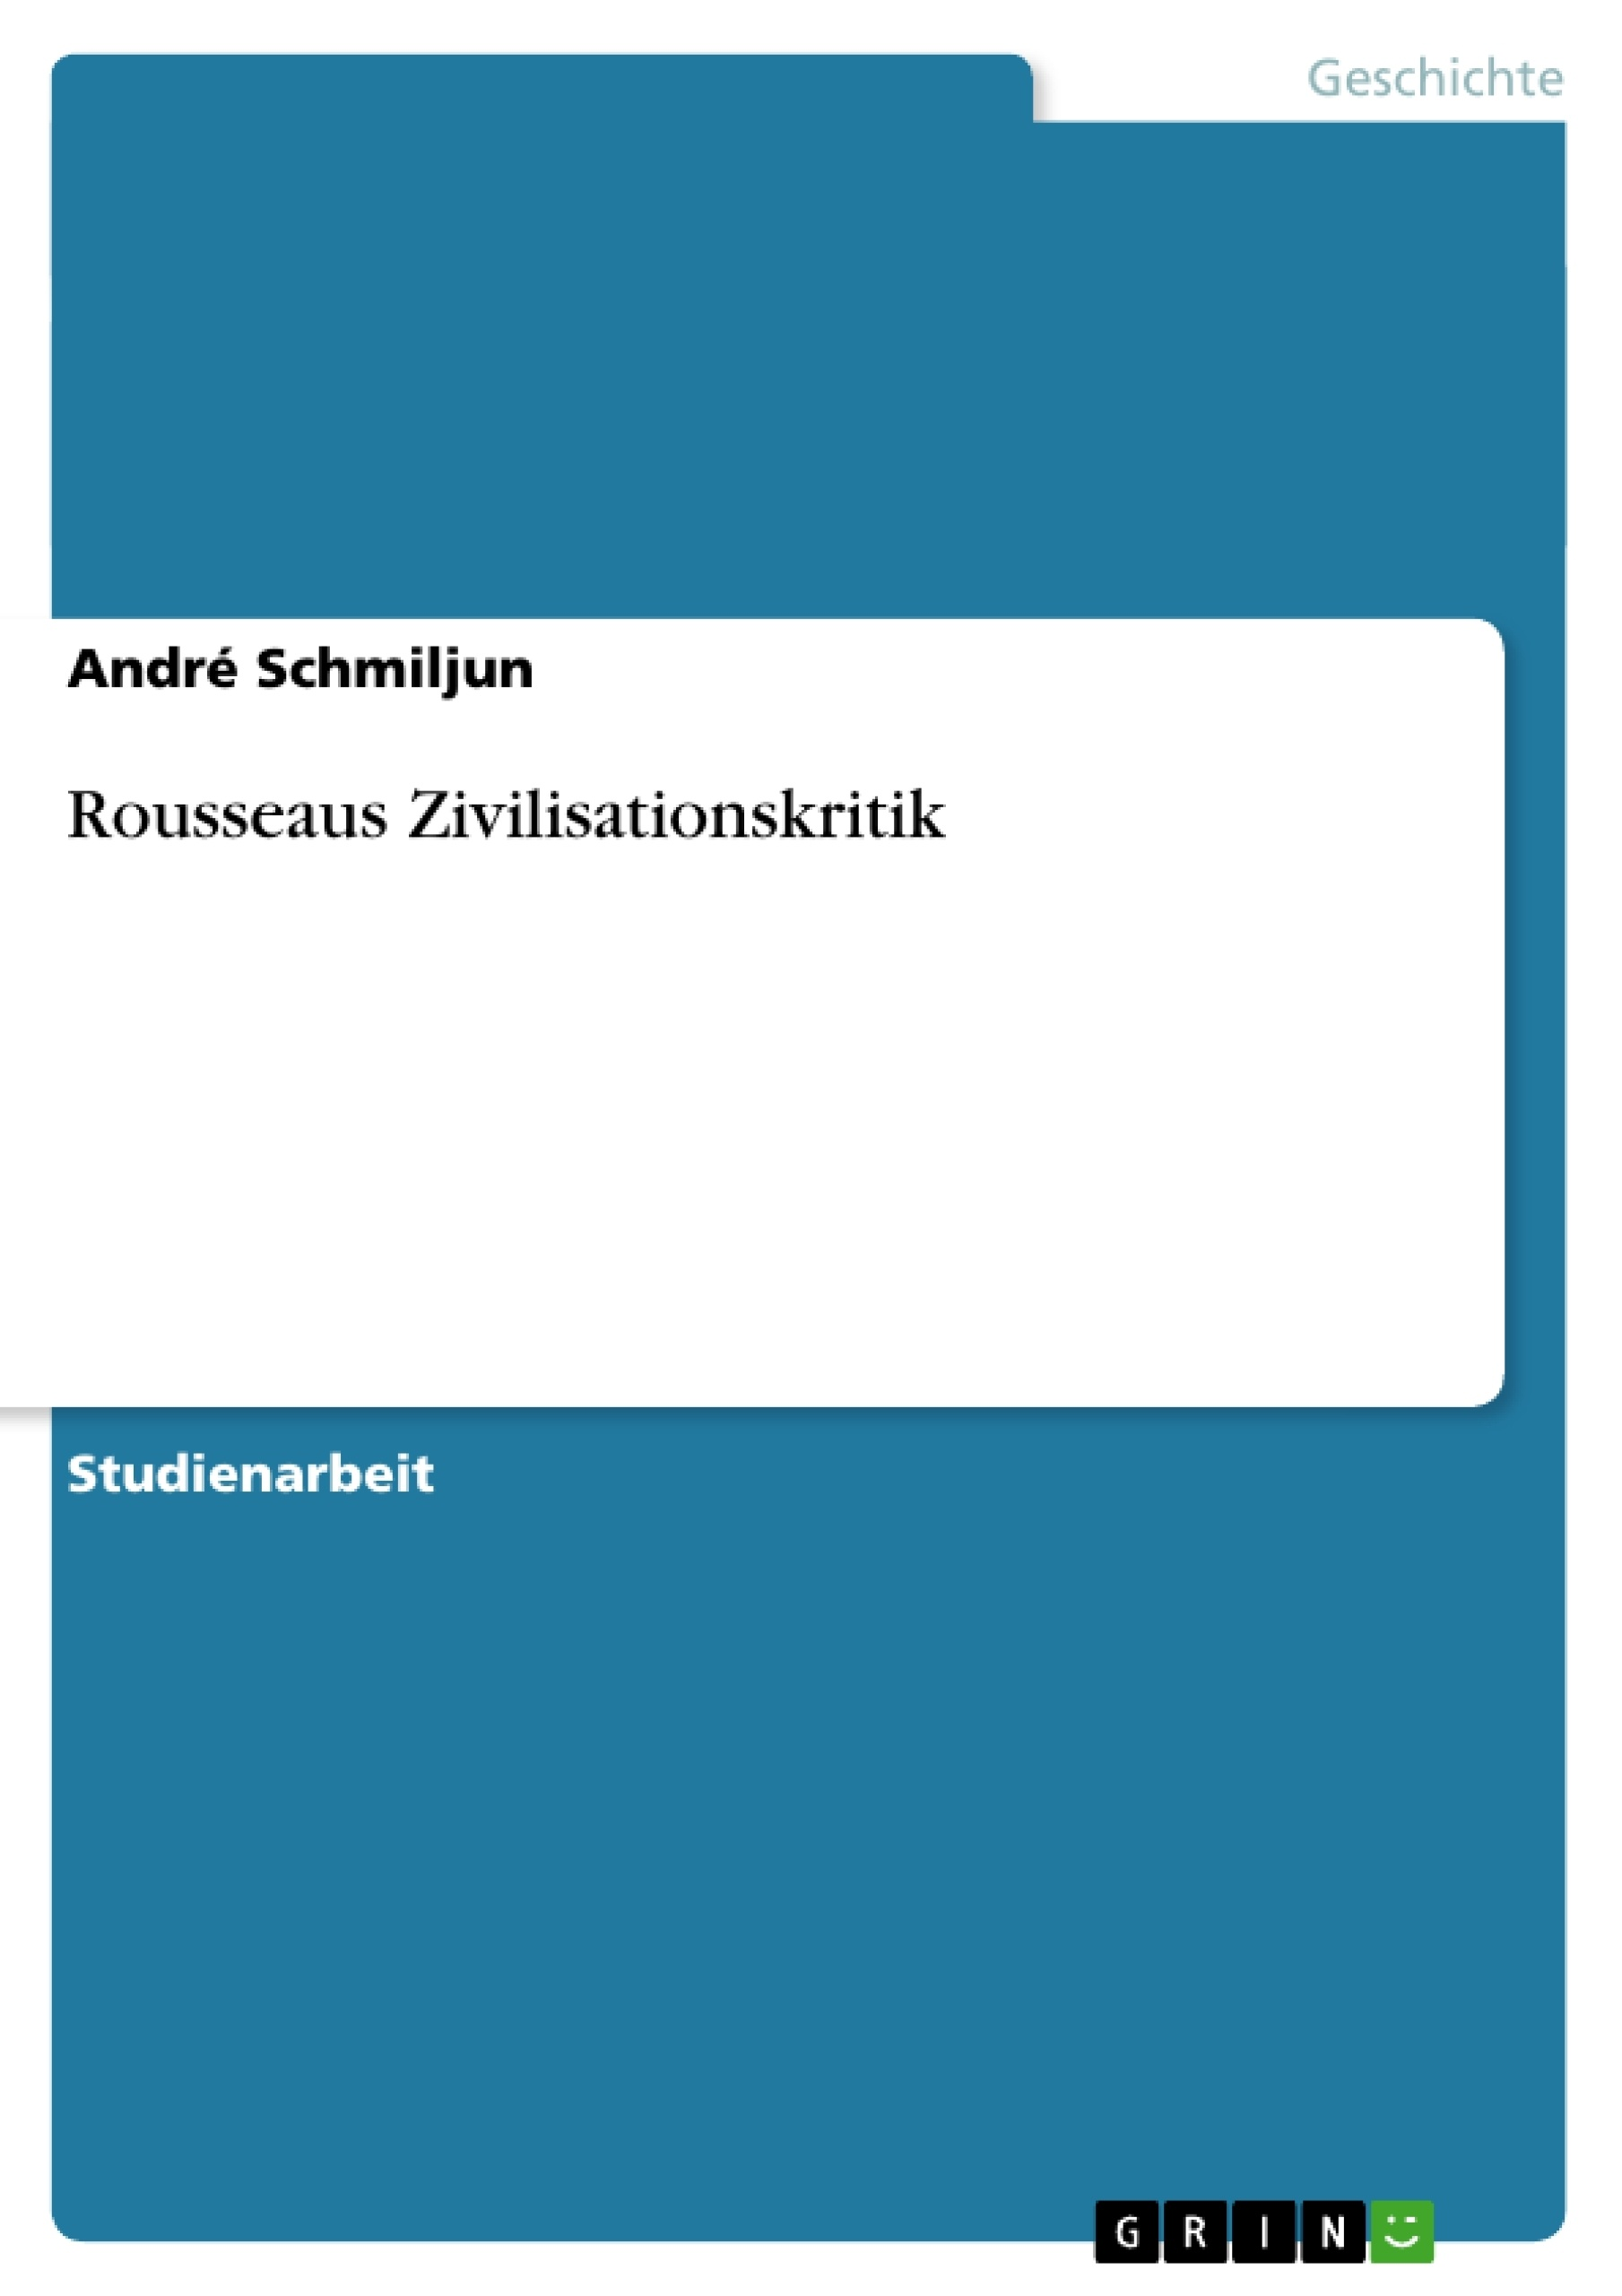 Titel: Rousseaus Zivilisationskritik